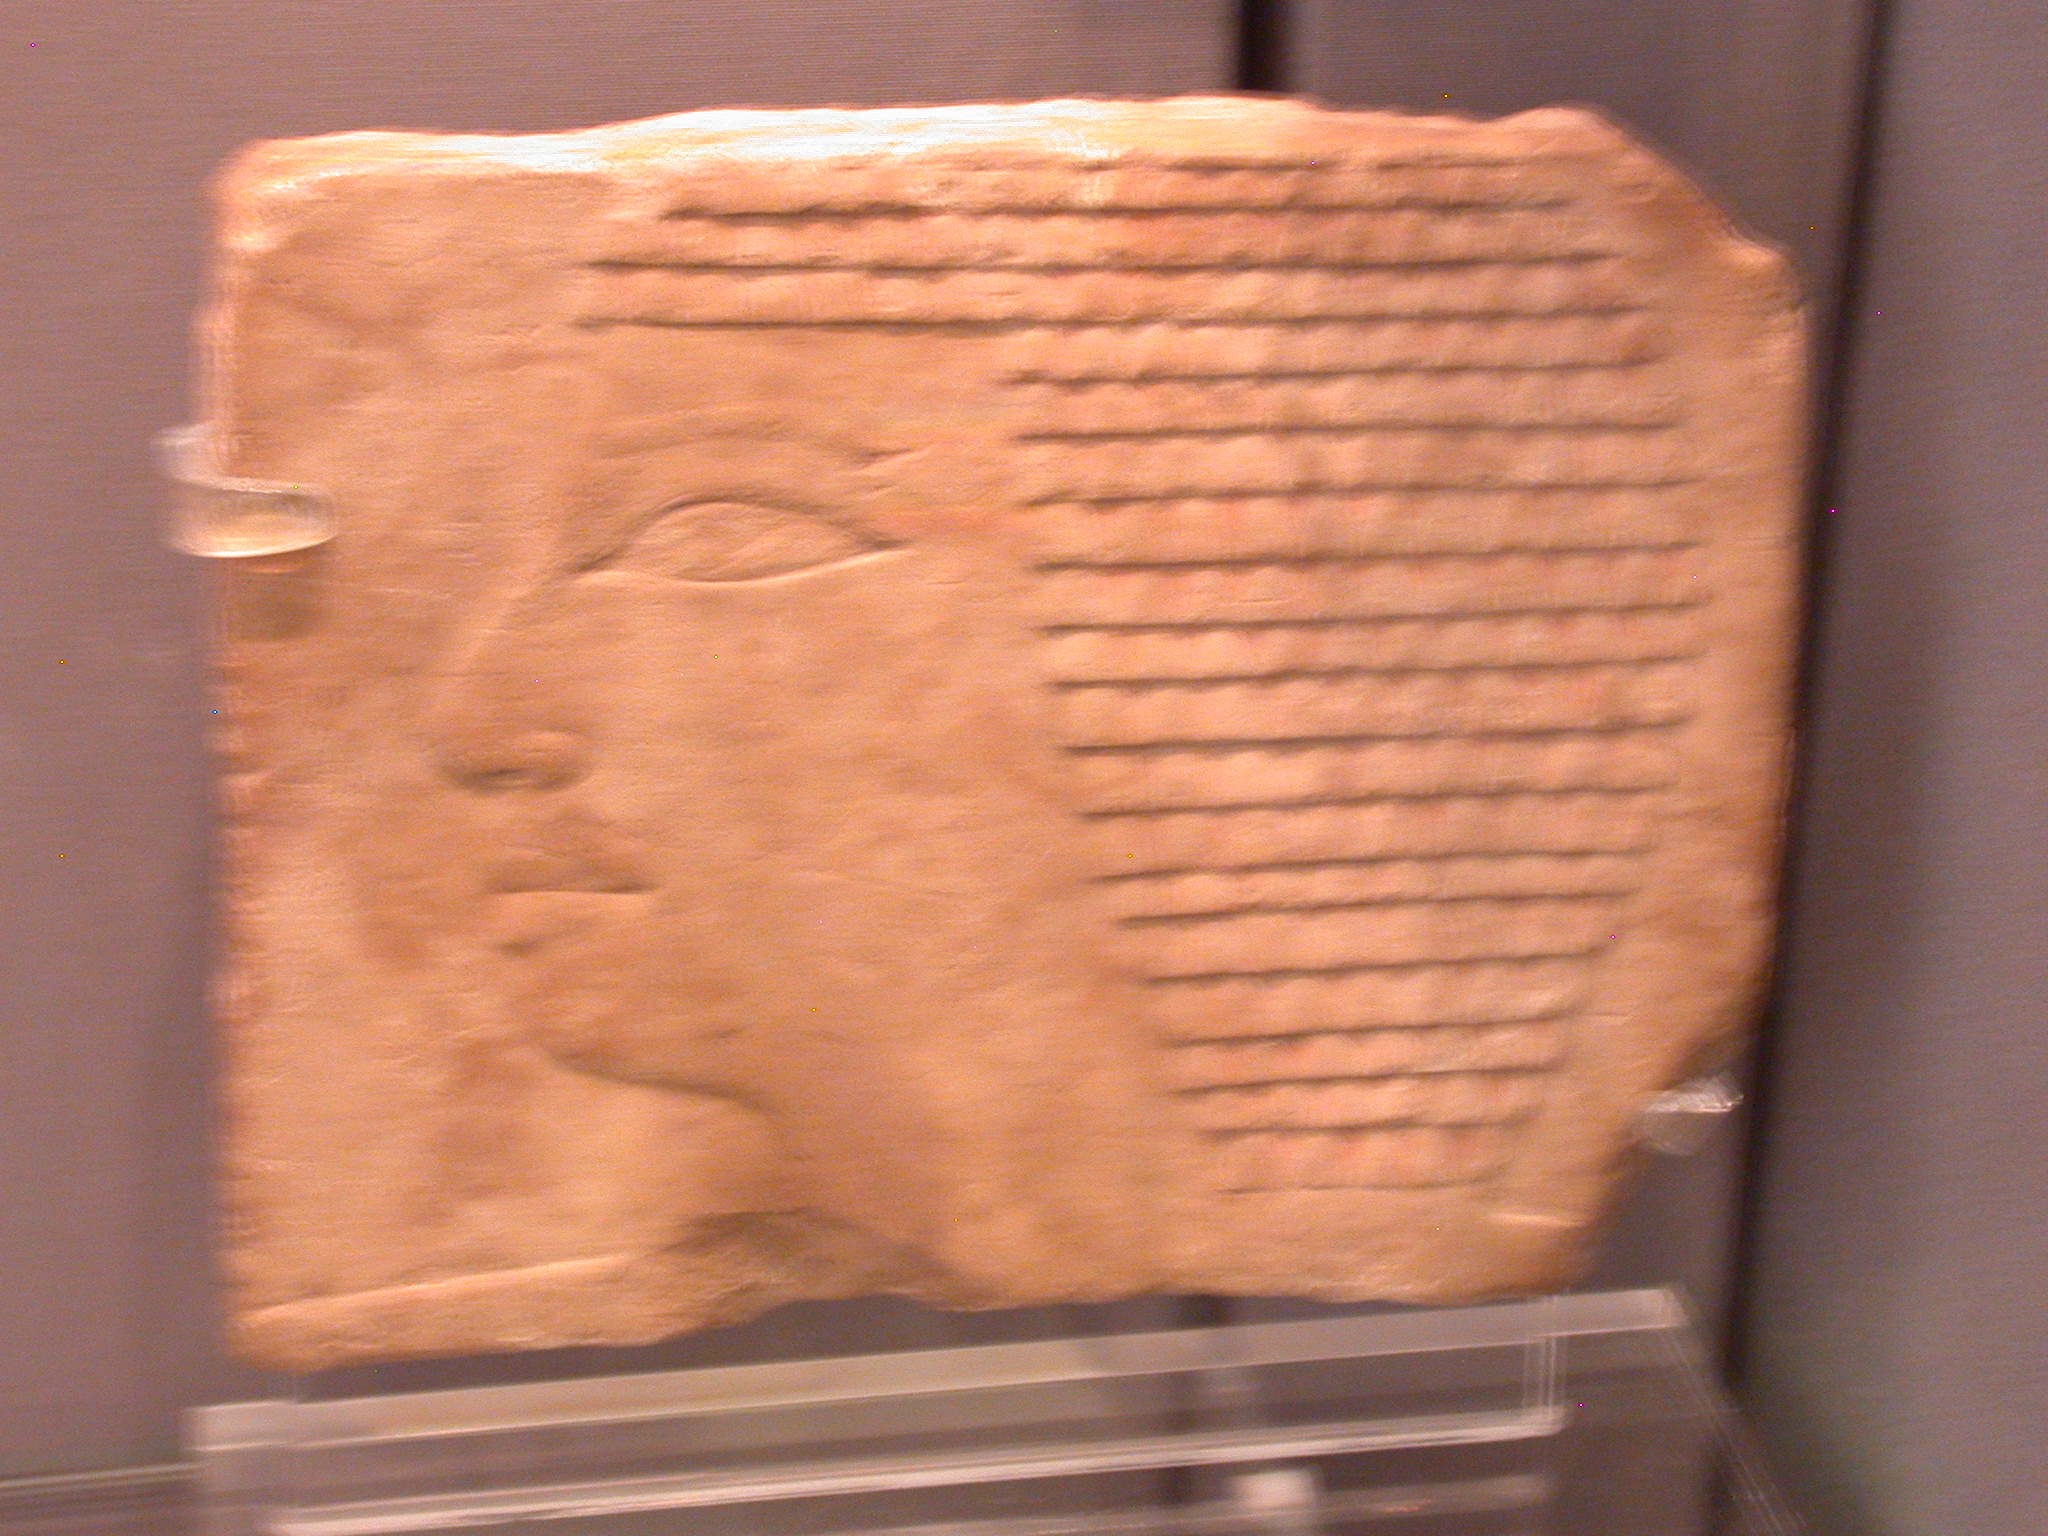 Archaized Relief, Limestone, Late Period, 746-525 BCE, Egypt, in Fitzwilliam Museum, Cambridge, England